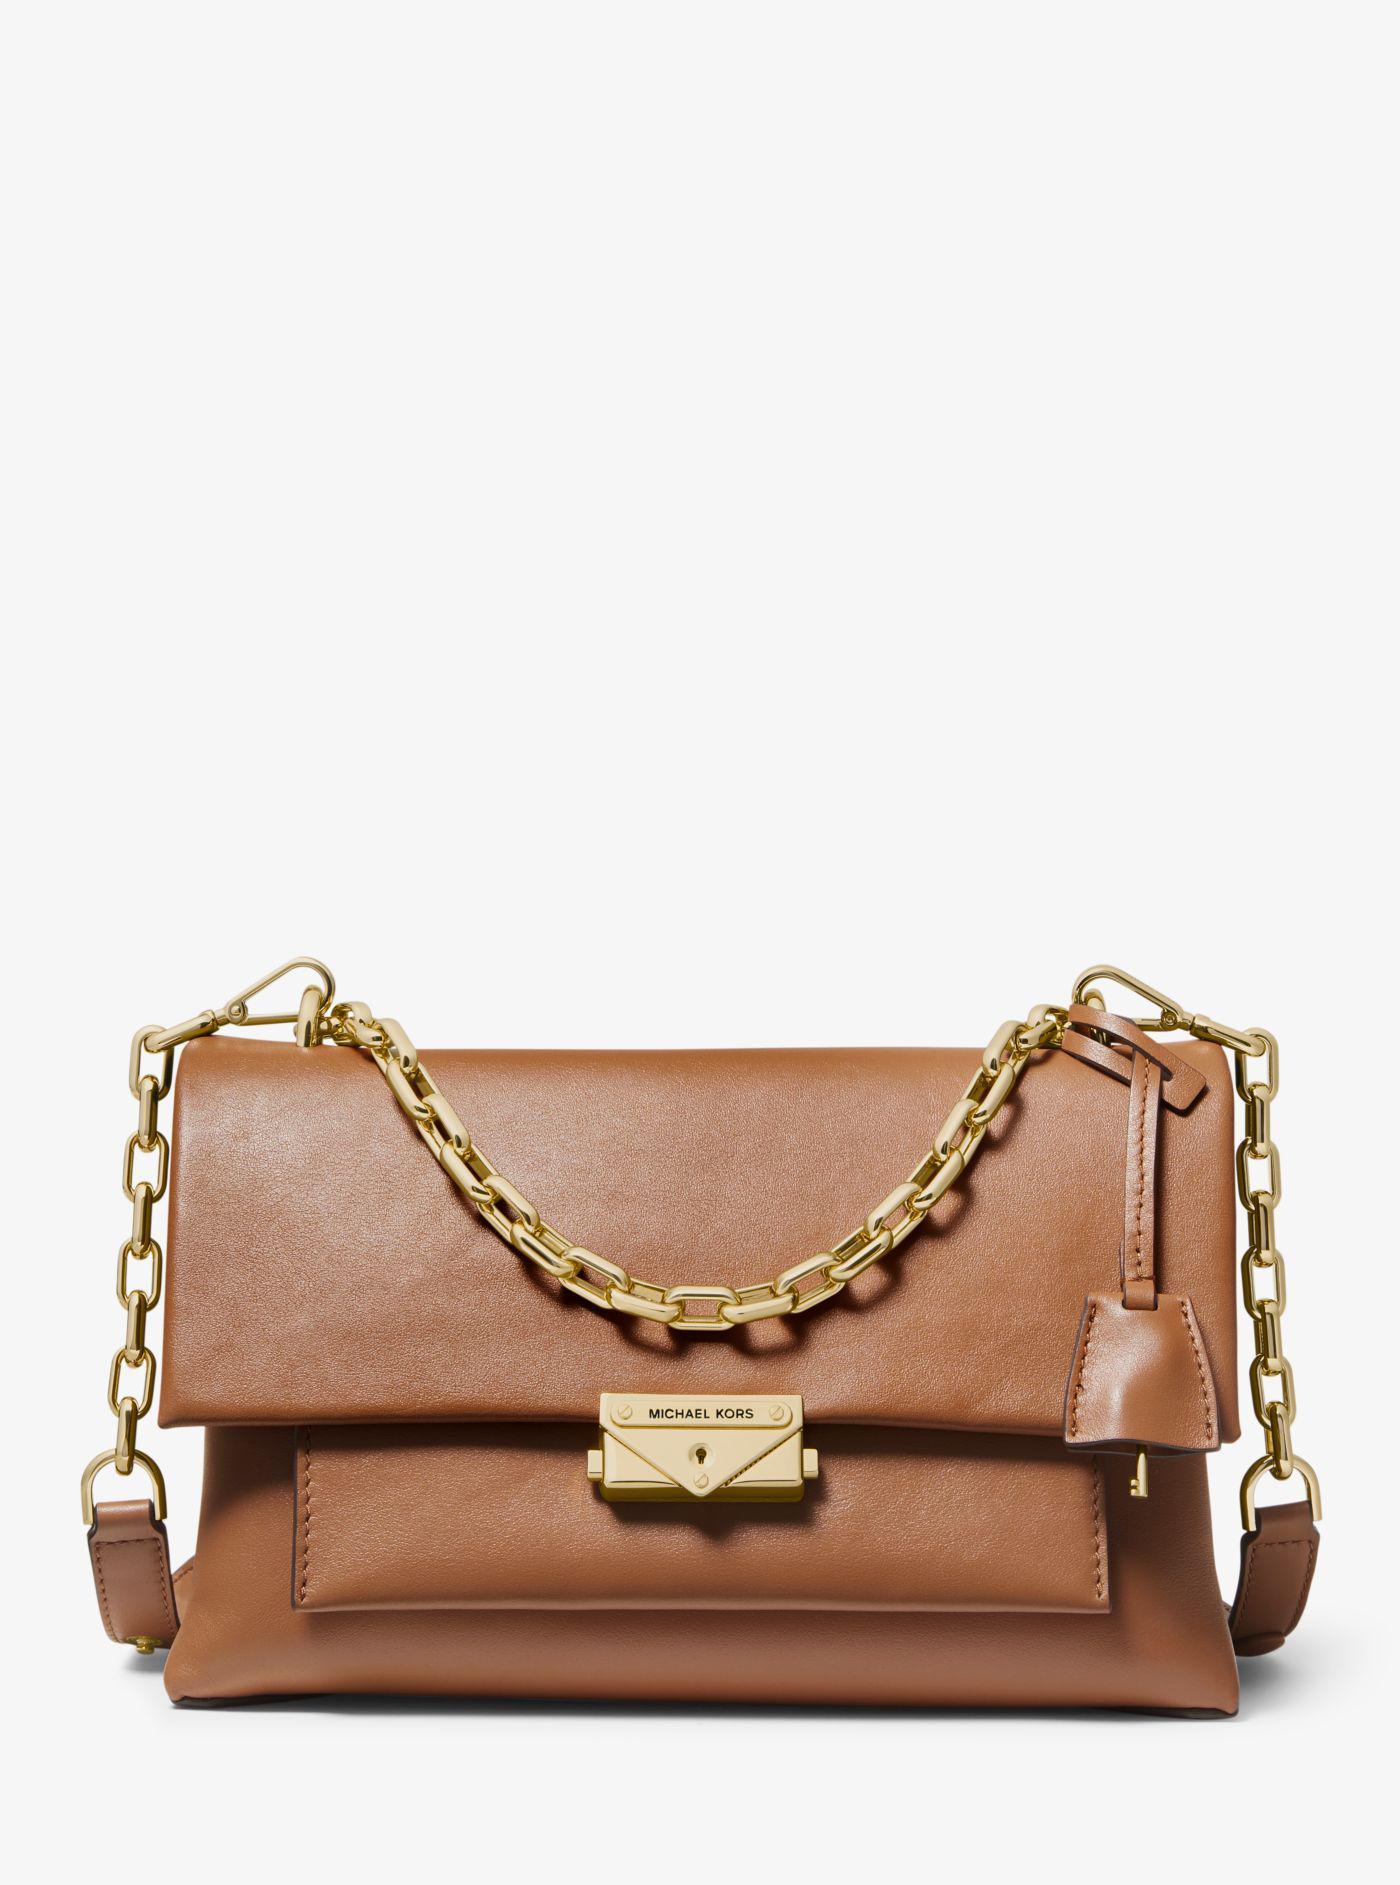 216347e6bc40 Michael Kors Cece Large Leather Shoulder Bag in Brown - Lyst